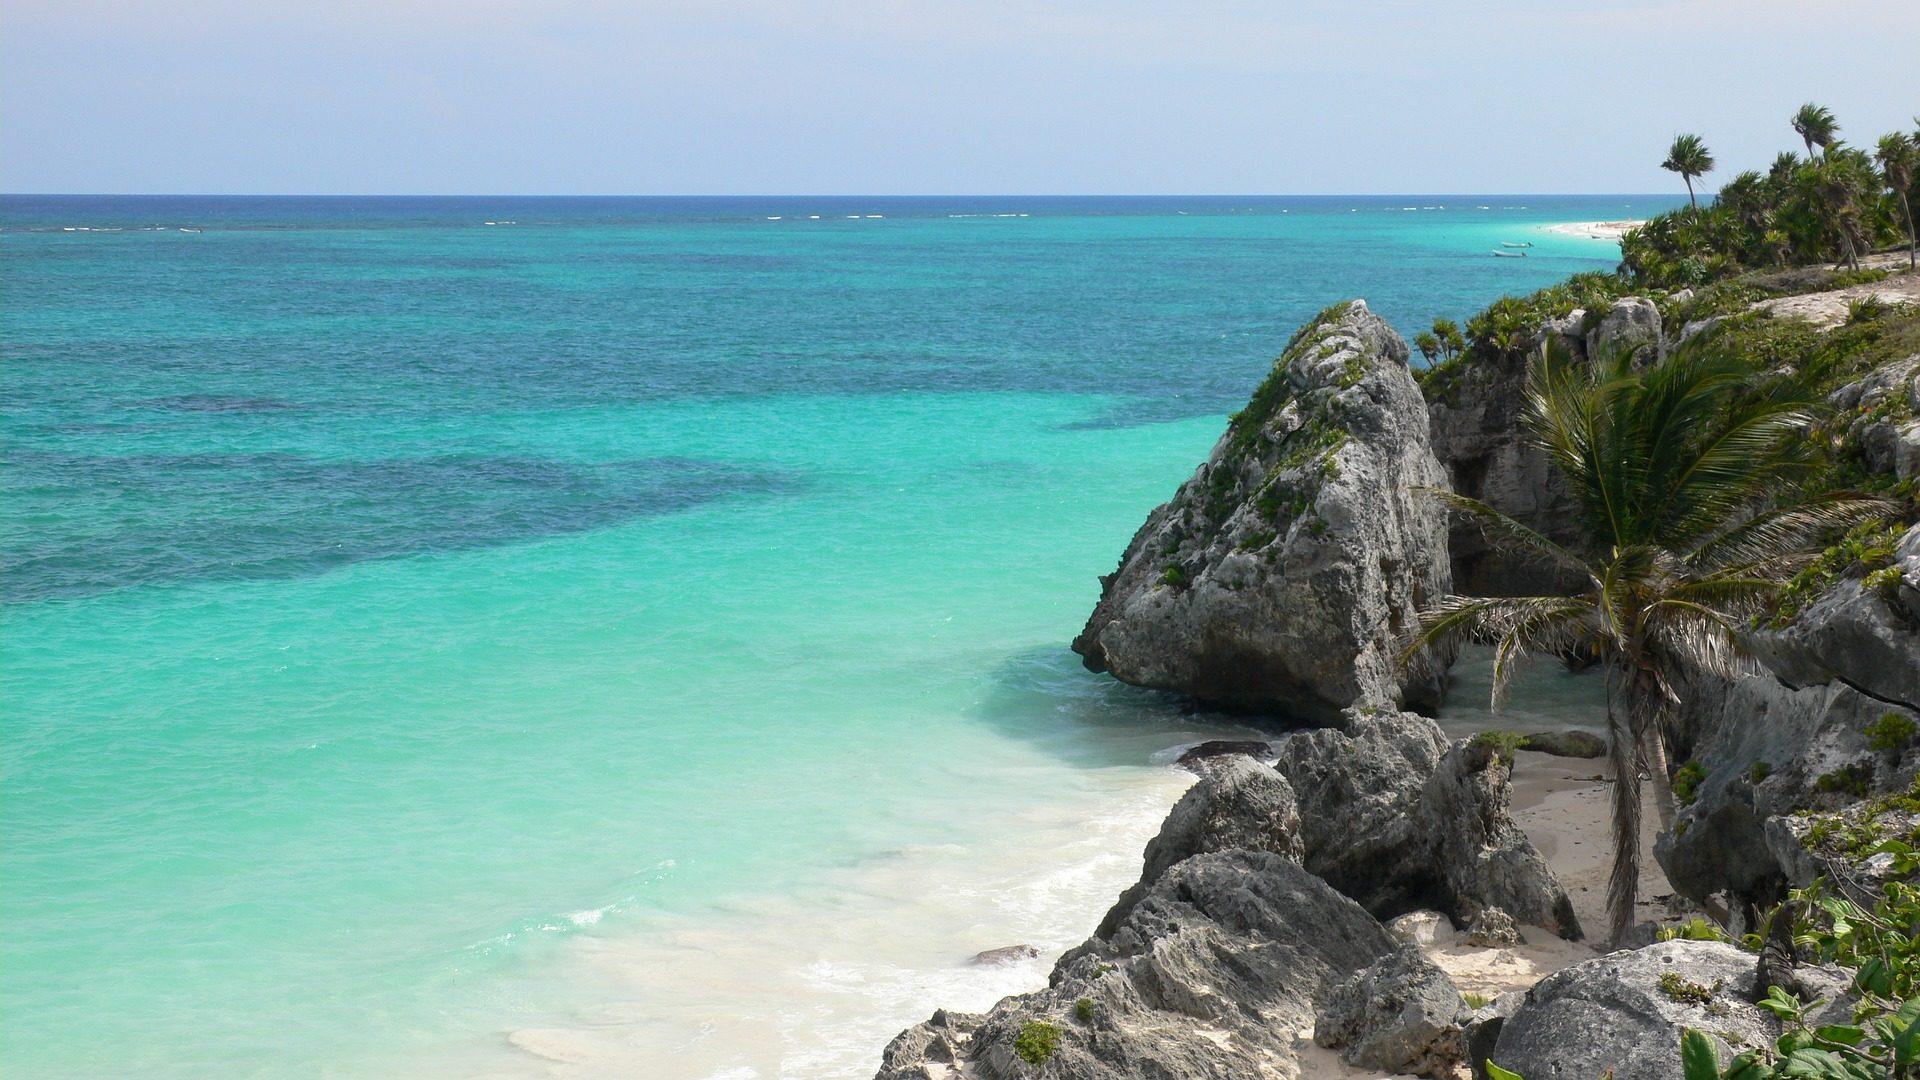 Mar, Praia, Turquesa, Paraíso, Rocas, Palmeiras, horizonte - Papéis de parede HD - Professor-falken.com